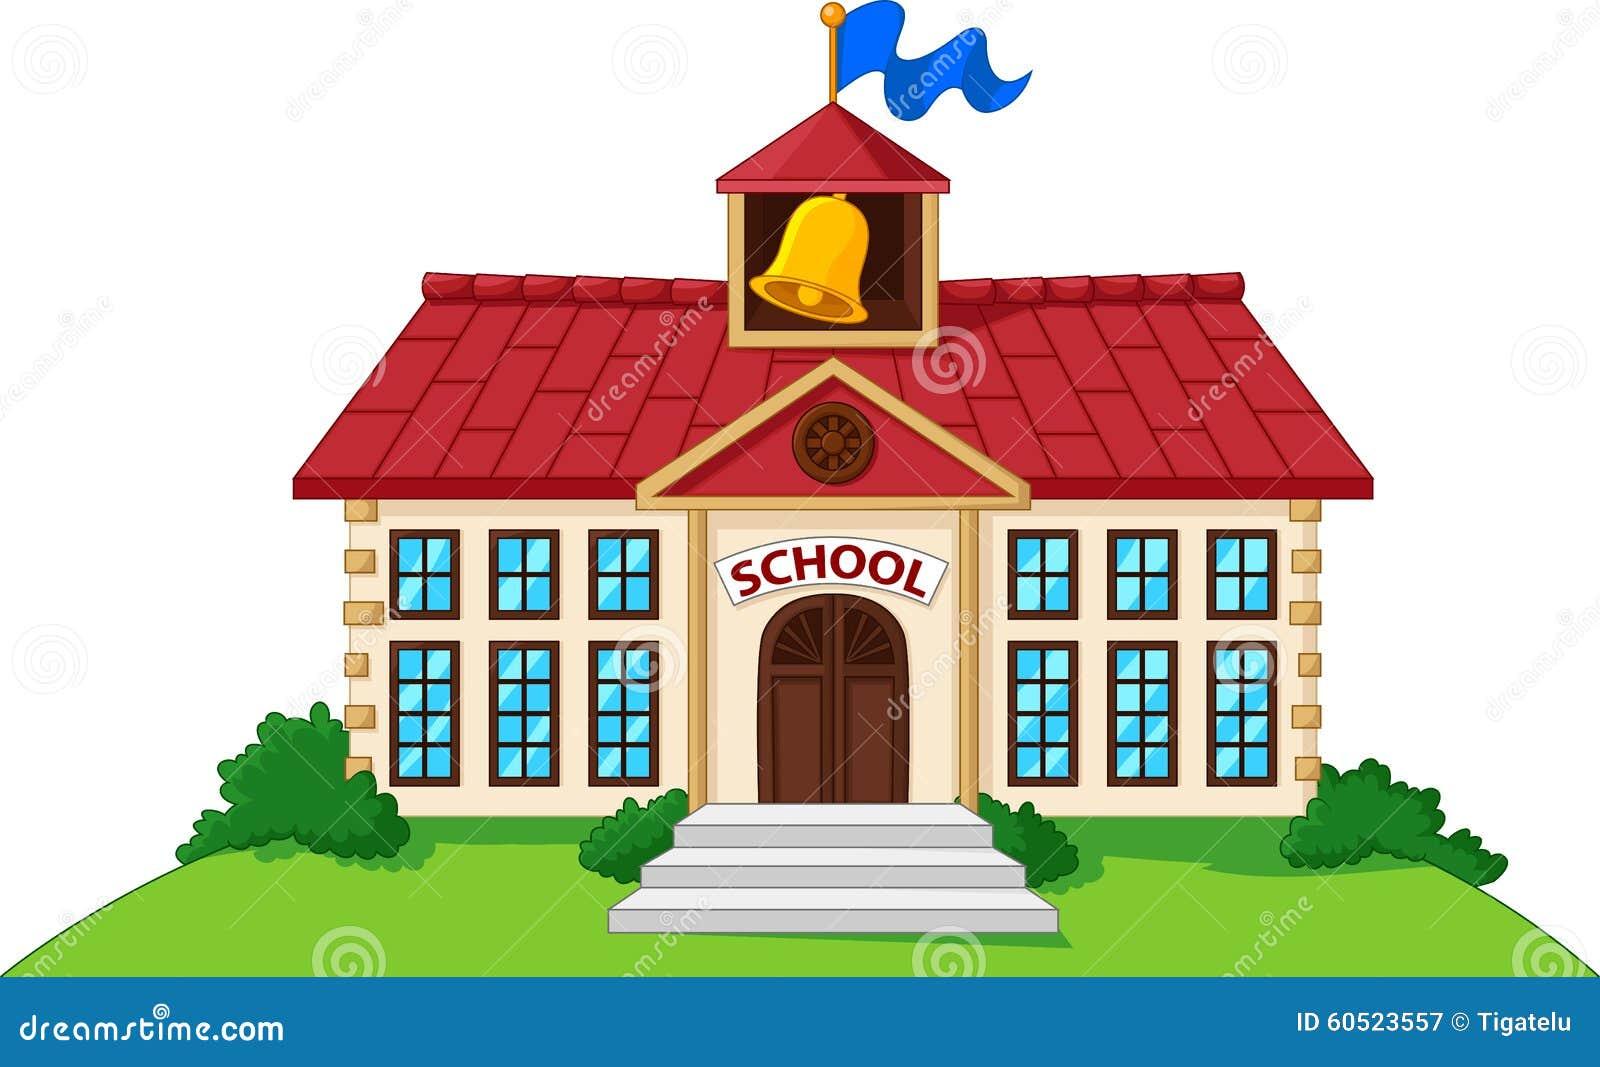 Cartoon School Building Isolated With Green Yard Stock Vector